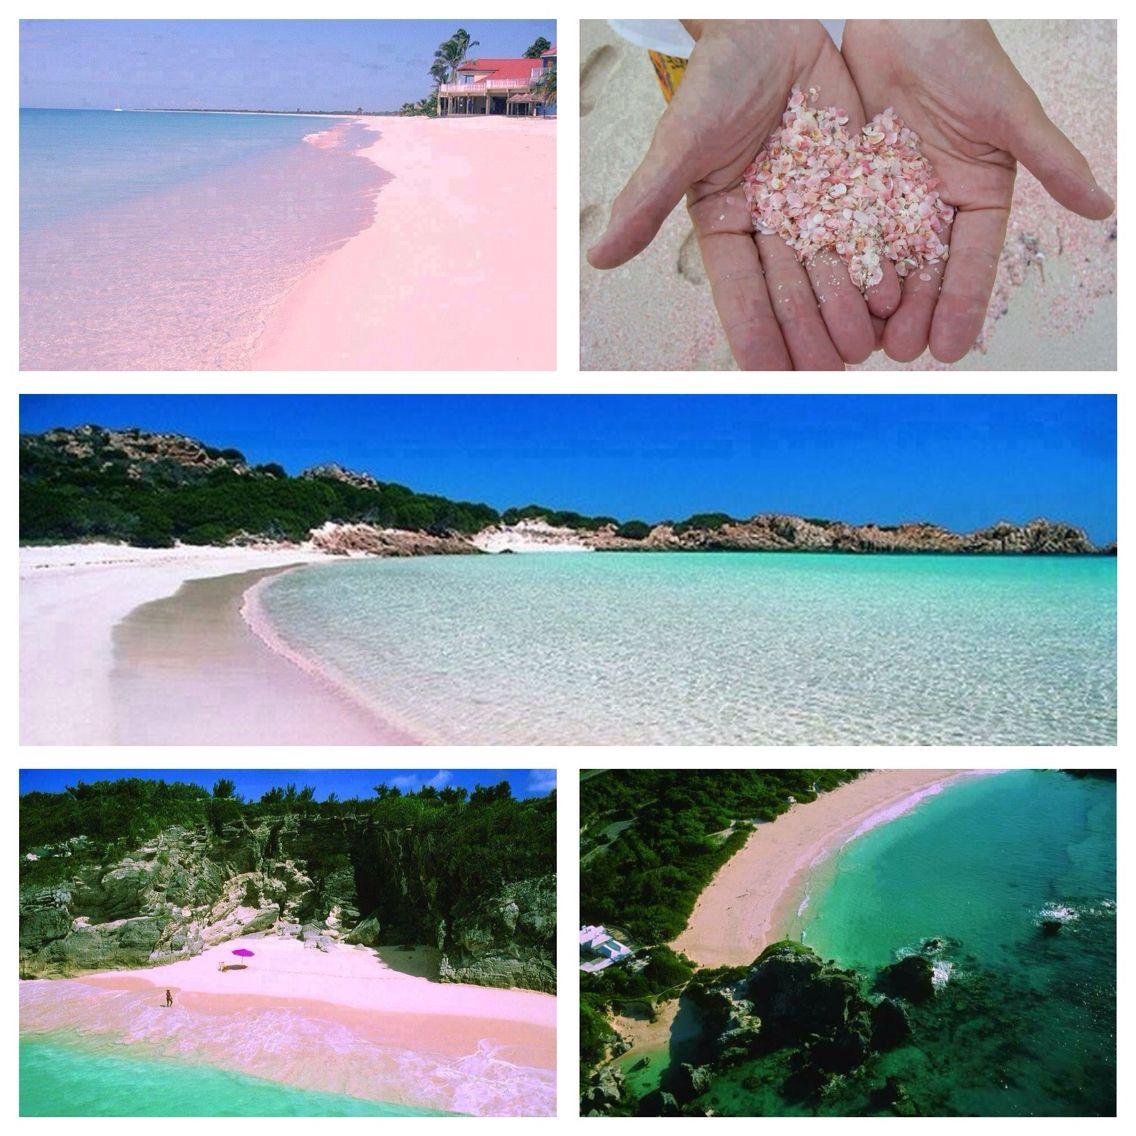 Seychelles Beach: Pink Sand Beaches (Bahamas, Bermuda, The Seychelles